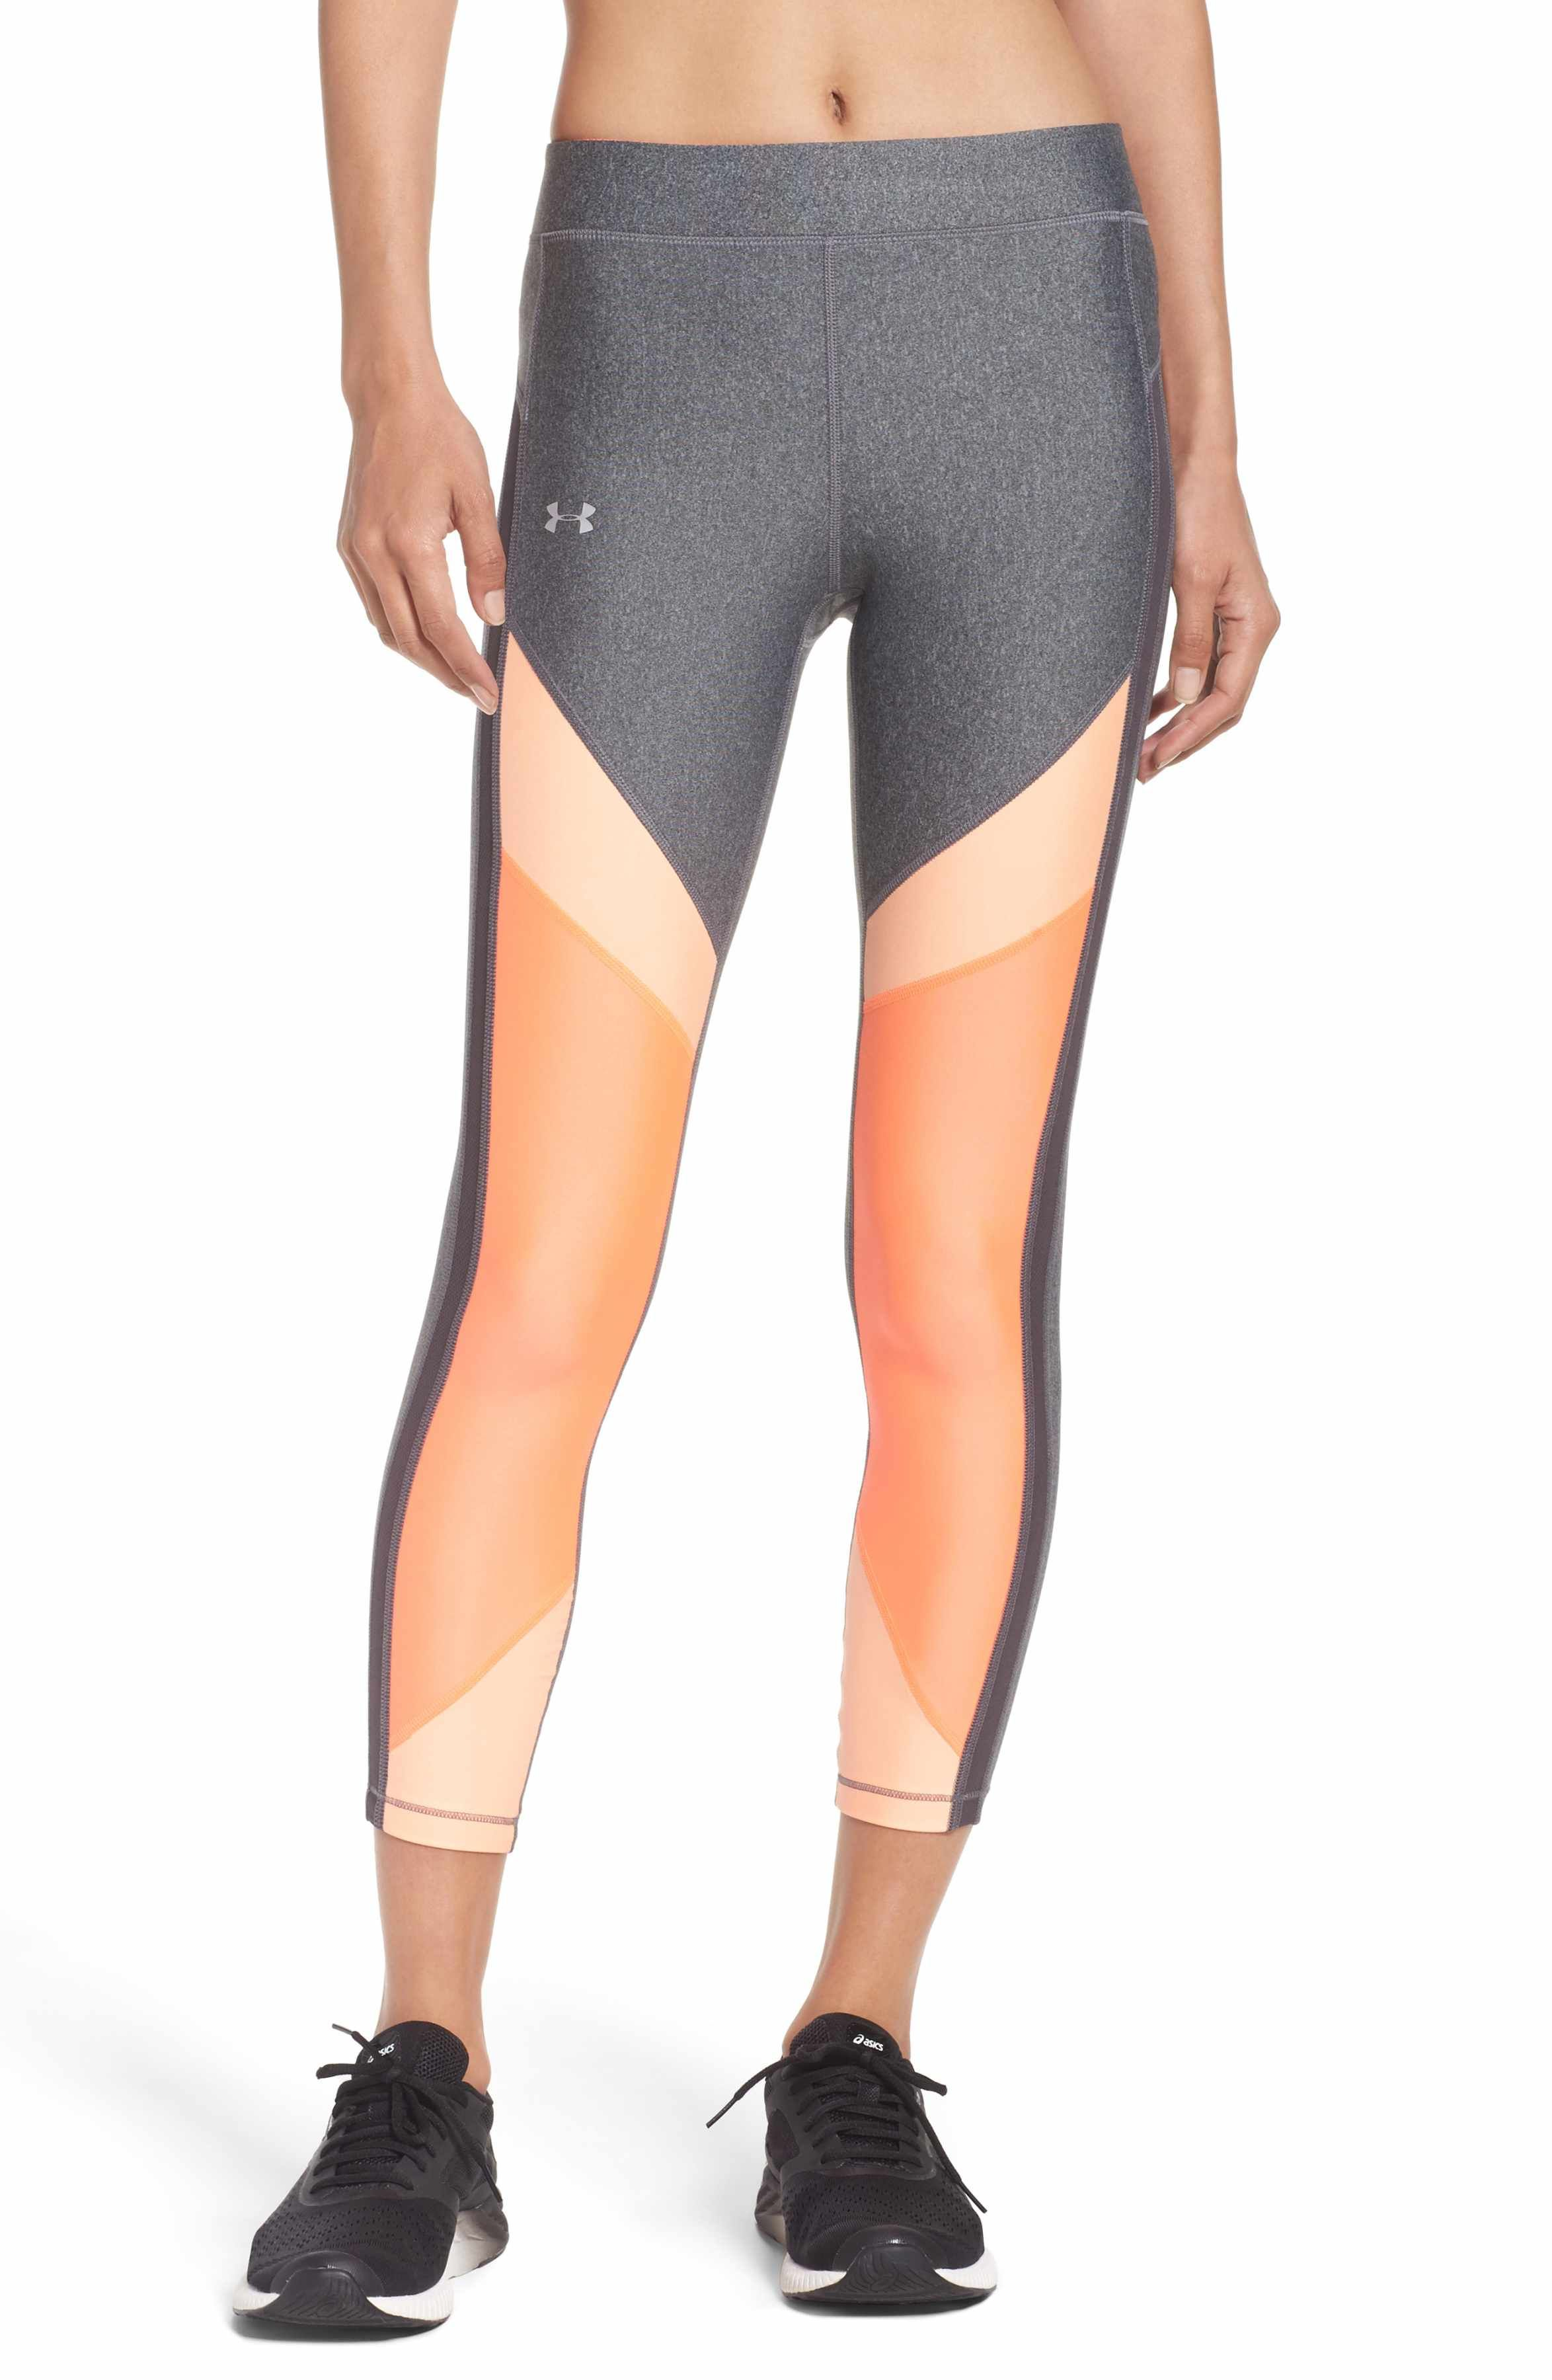 877c987e3c Main Image - Under Armour HeatGear® Midi Leggings   want to wear in ...